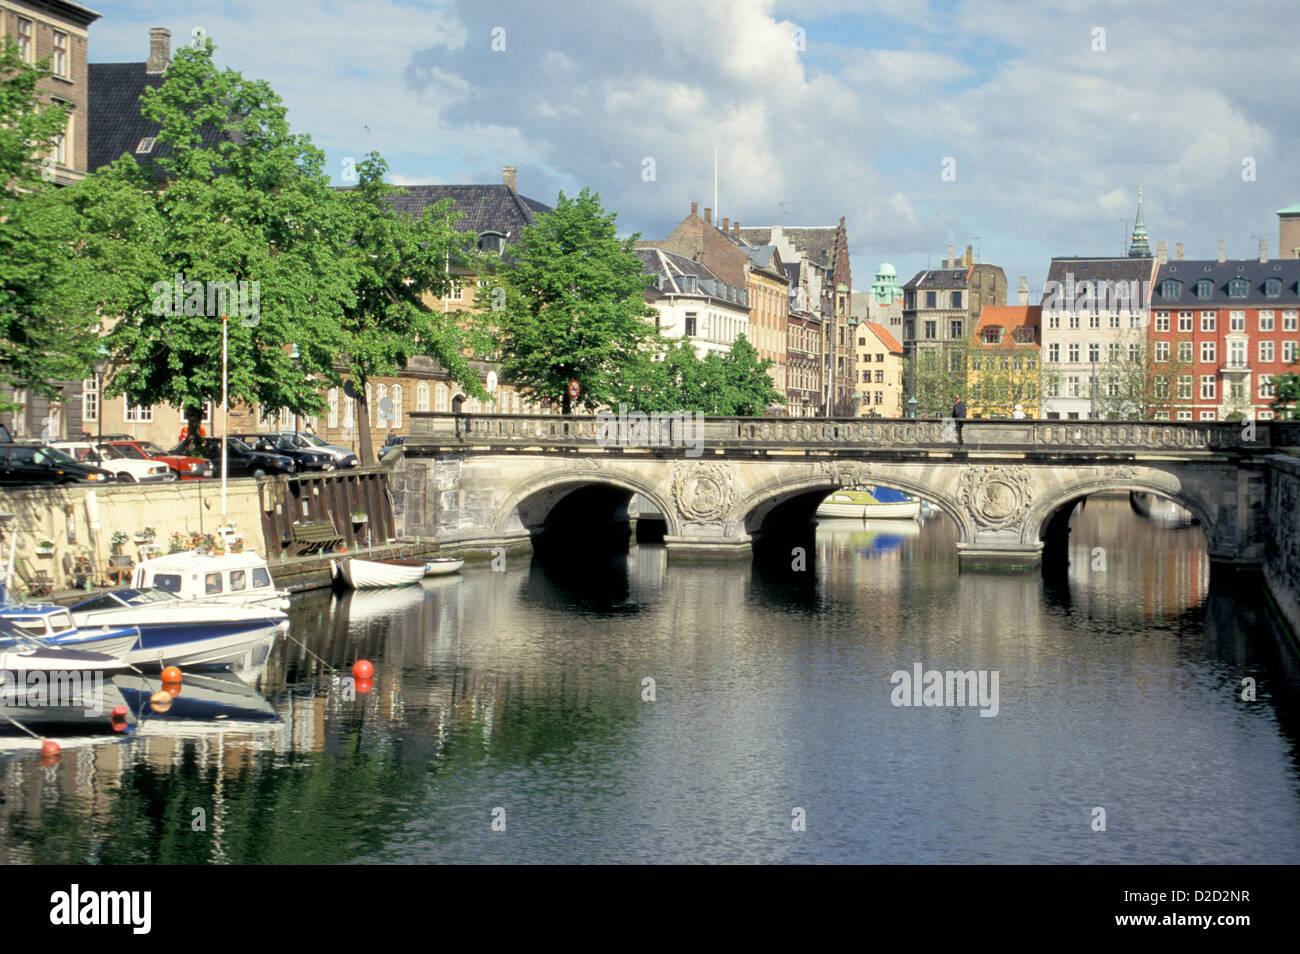 Denmark, Copenhagen. Marmorbroen Spanning Frederiksholms Kanal. - Stock Image